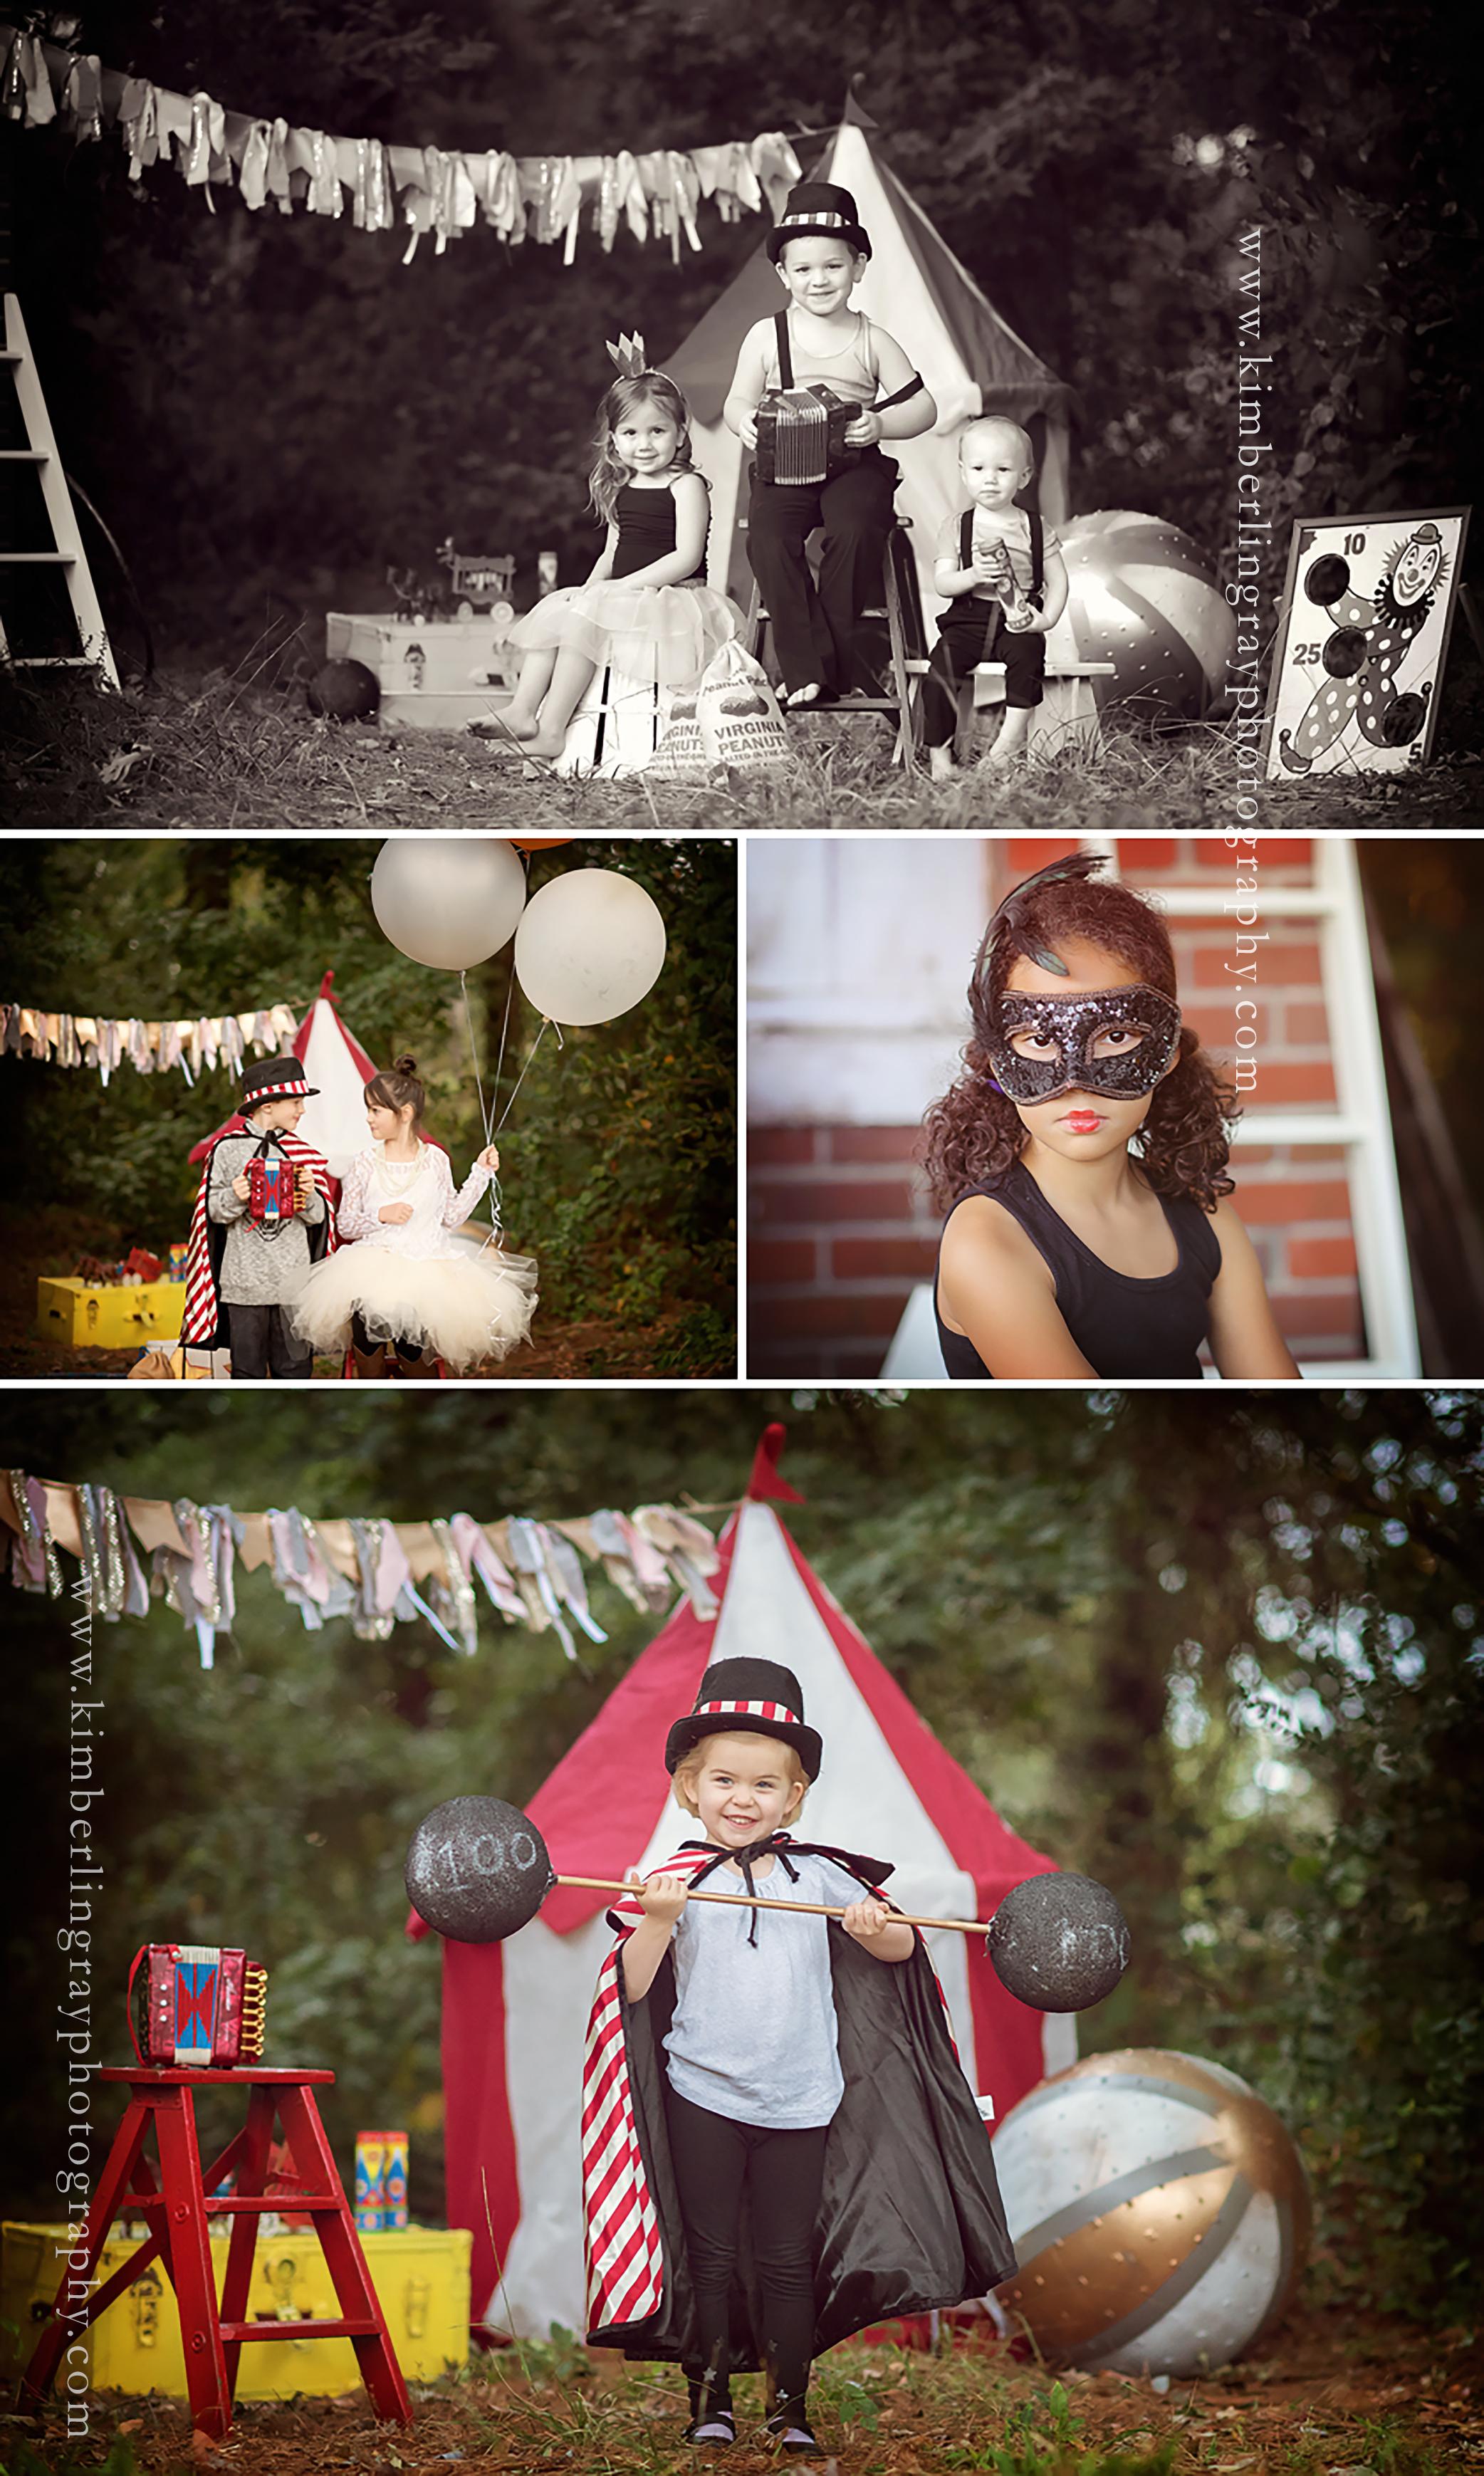 vintage-circus-photo.jpg